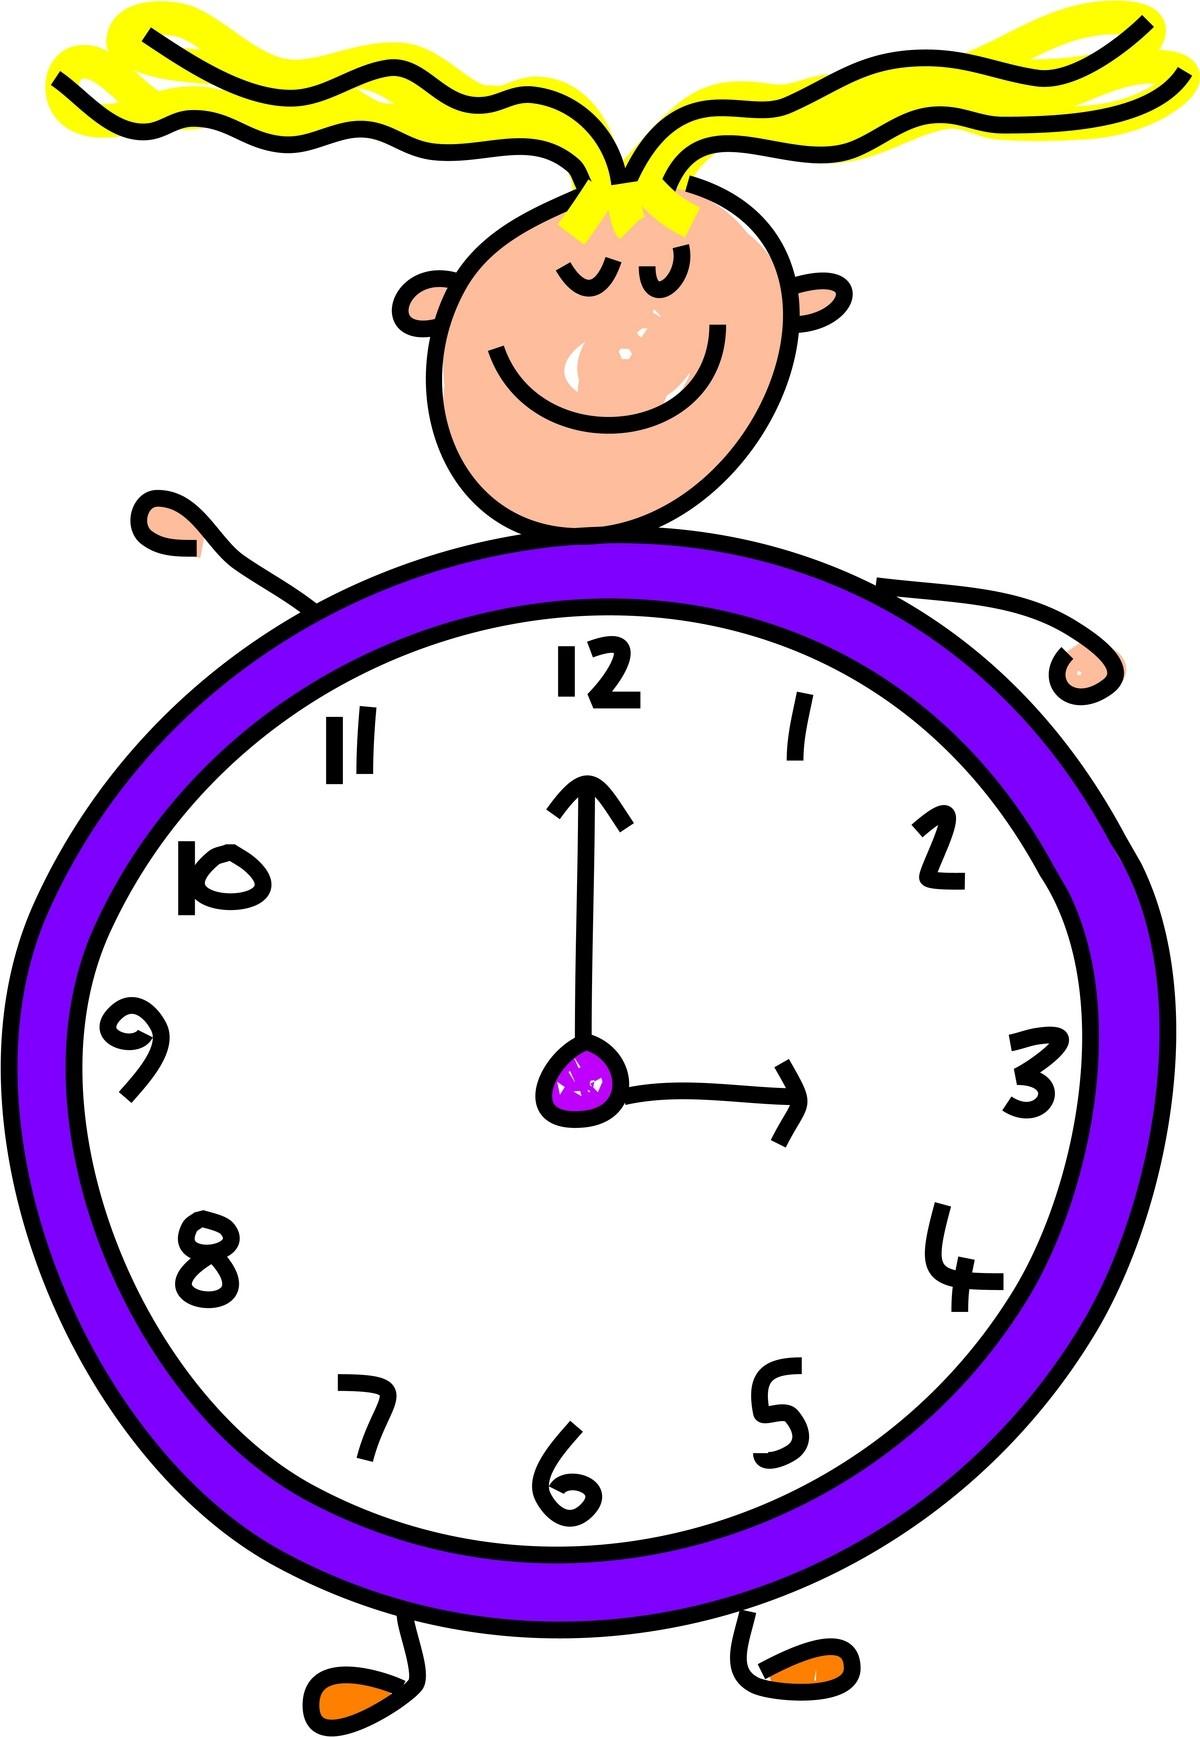 Lunch Time Clip Art Clipart .-Lunch Time Clip Art Clipart .-9